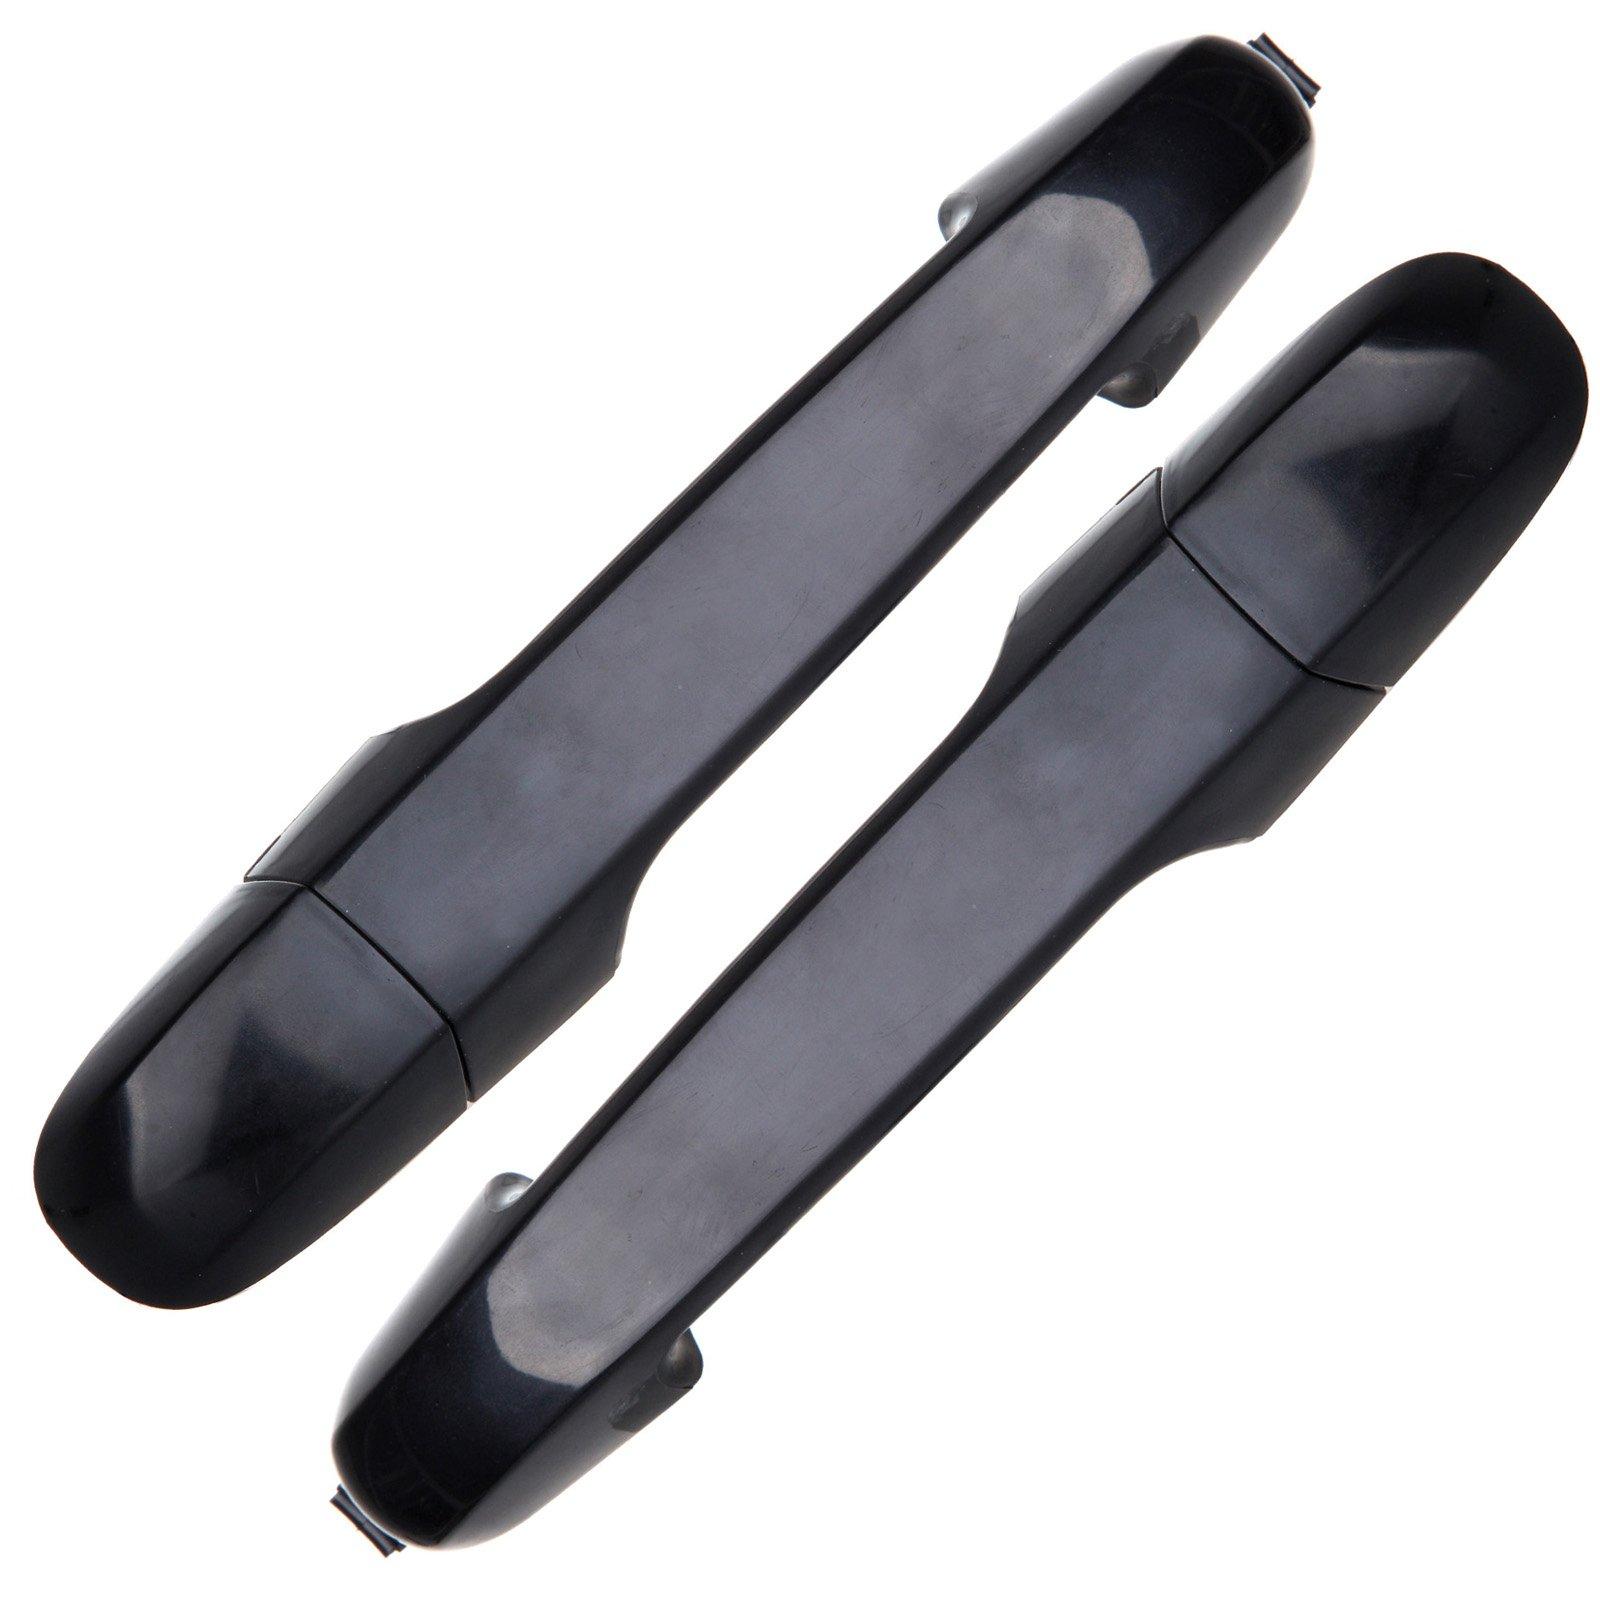 SCITOO 2Pcs Door Handle Black Exterior Rear Right Left Side fits Hyundai Elantra 2006-2012